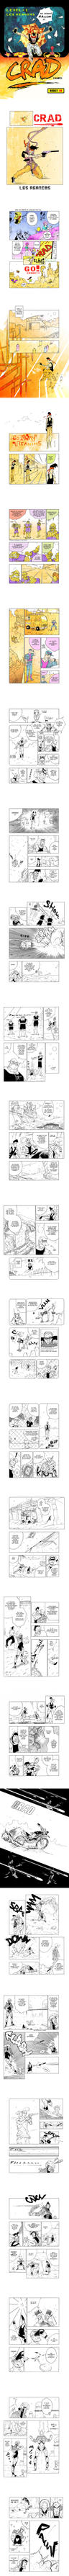 CRAD extrait du Manga by Camps-dessin